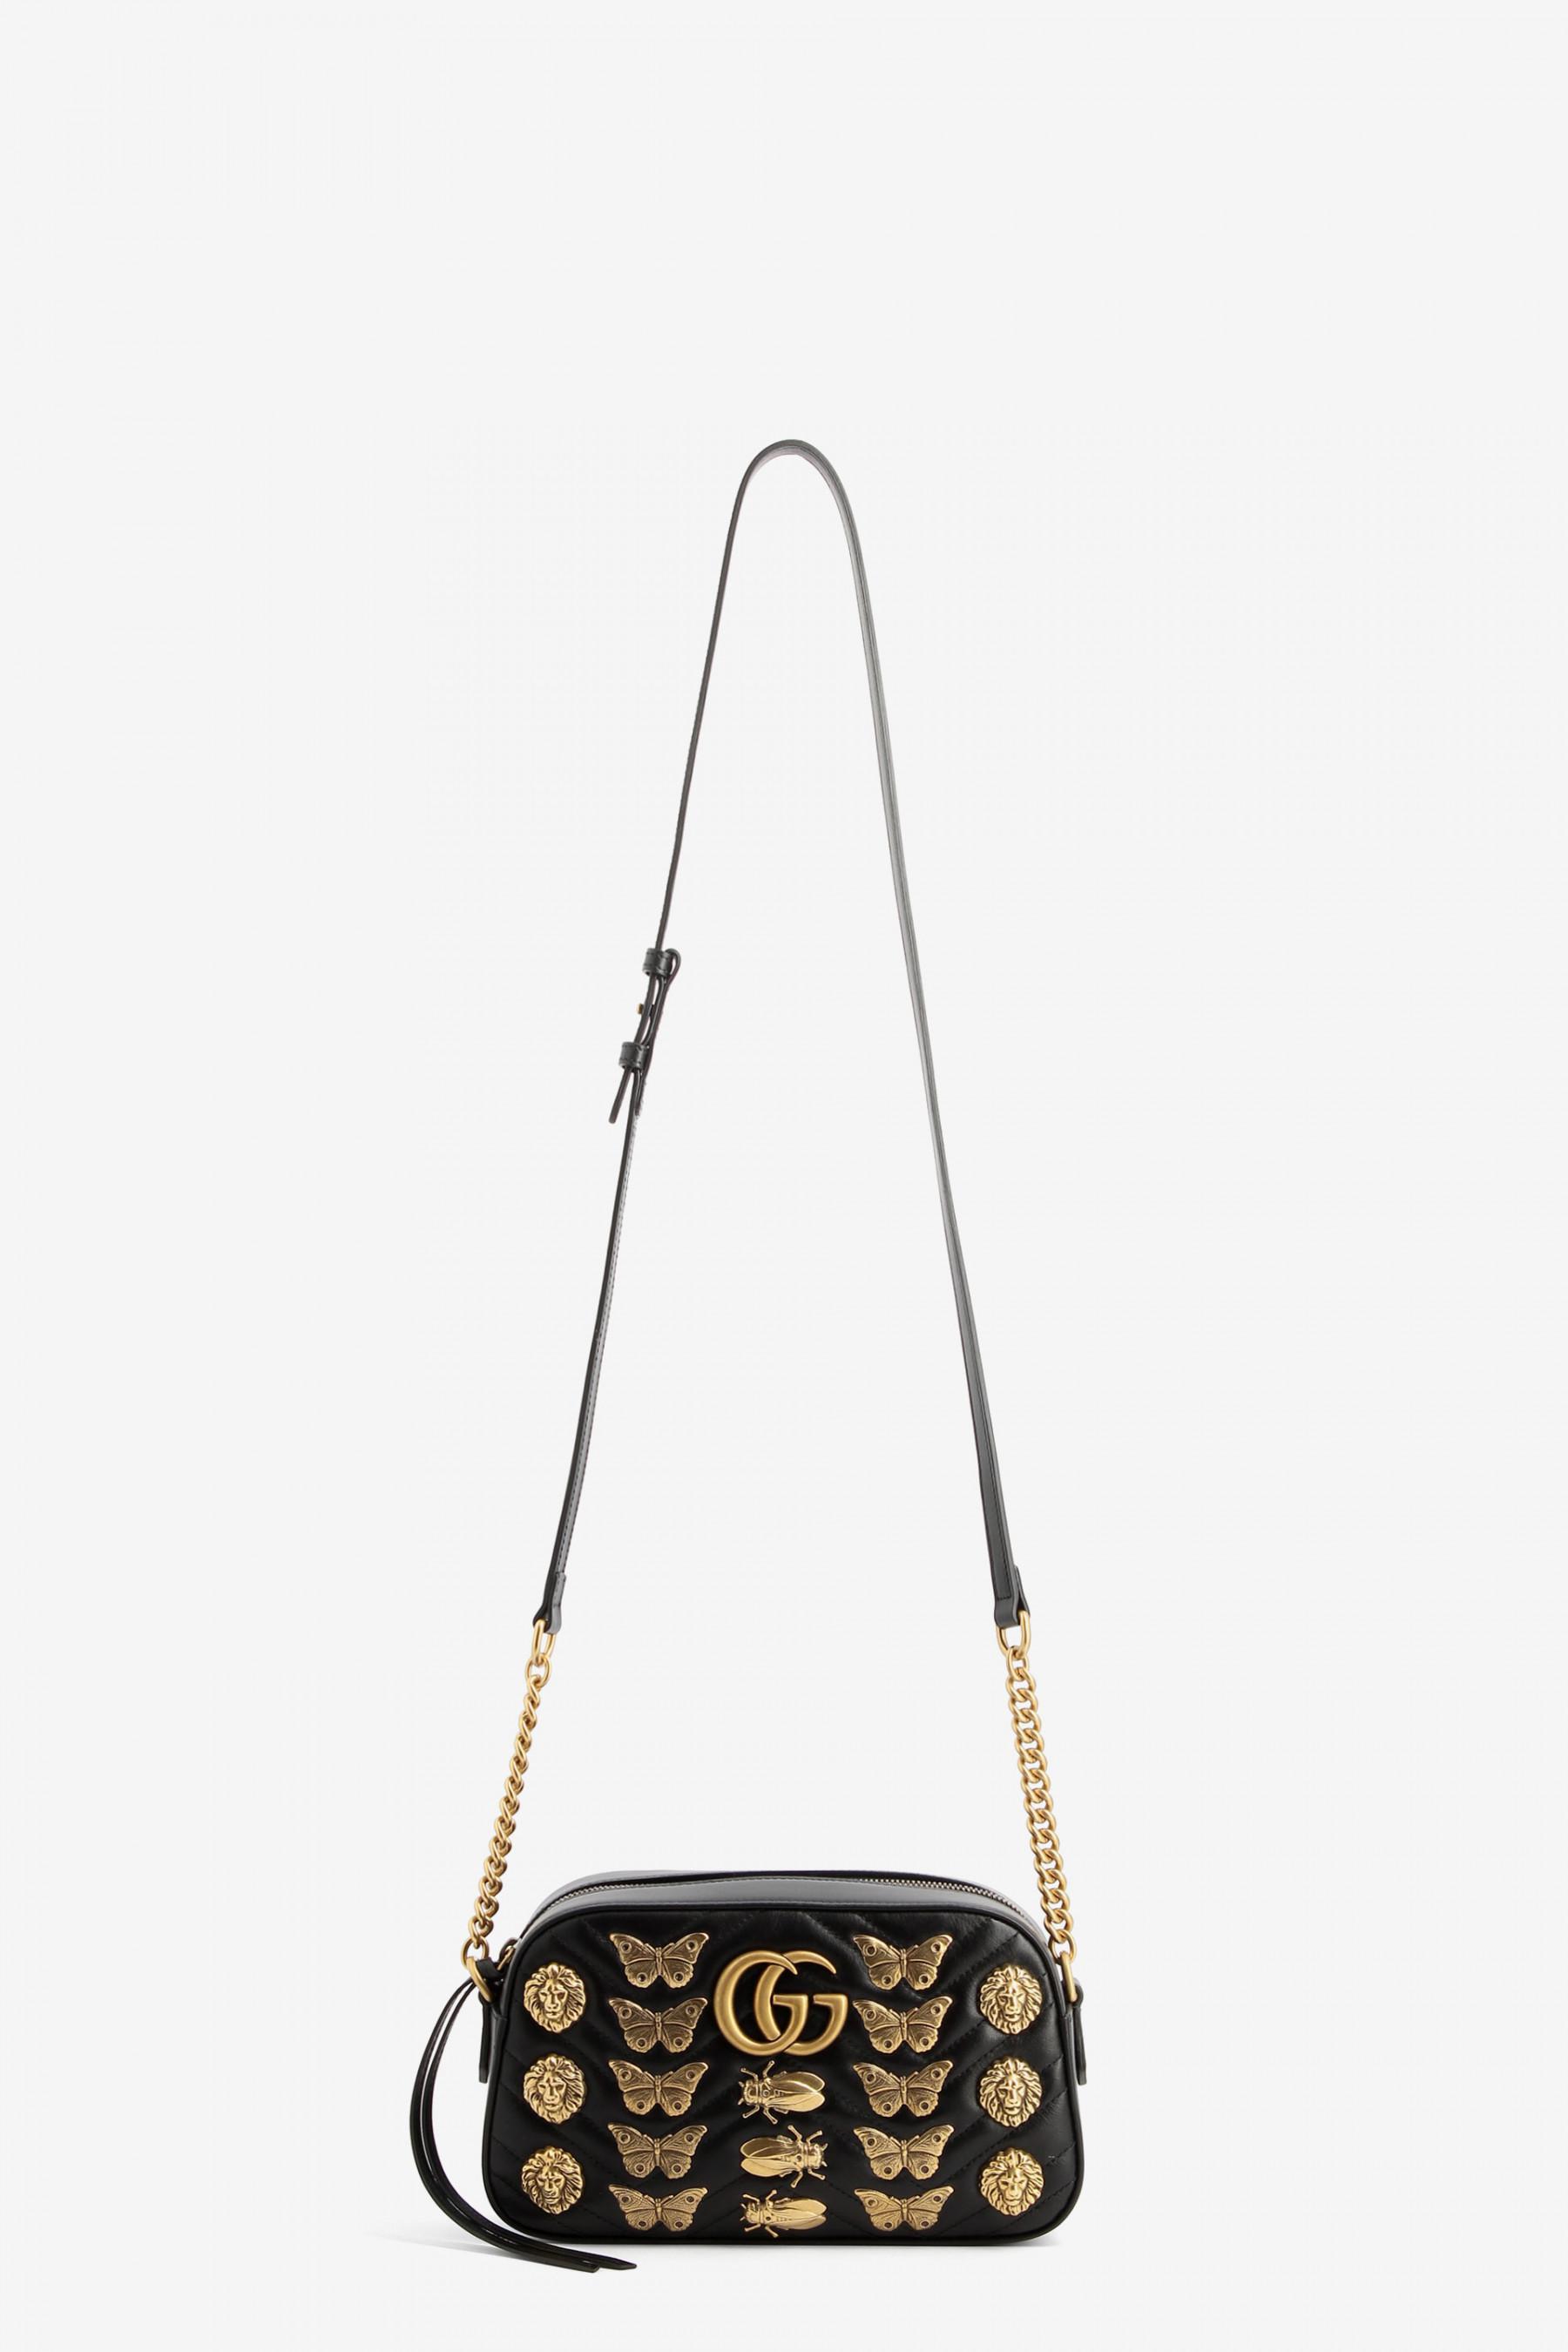 44494feb551e Lyst - Gucci Marmont Animals Bag in Black